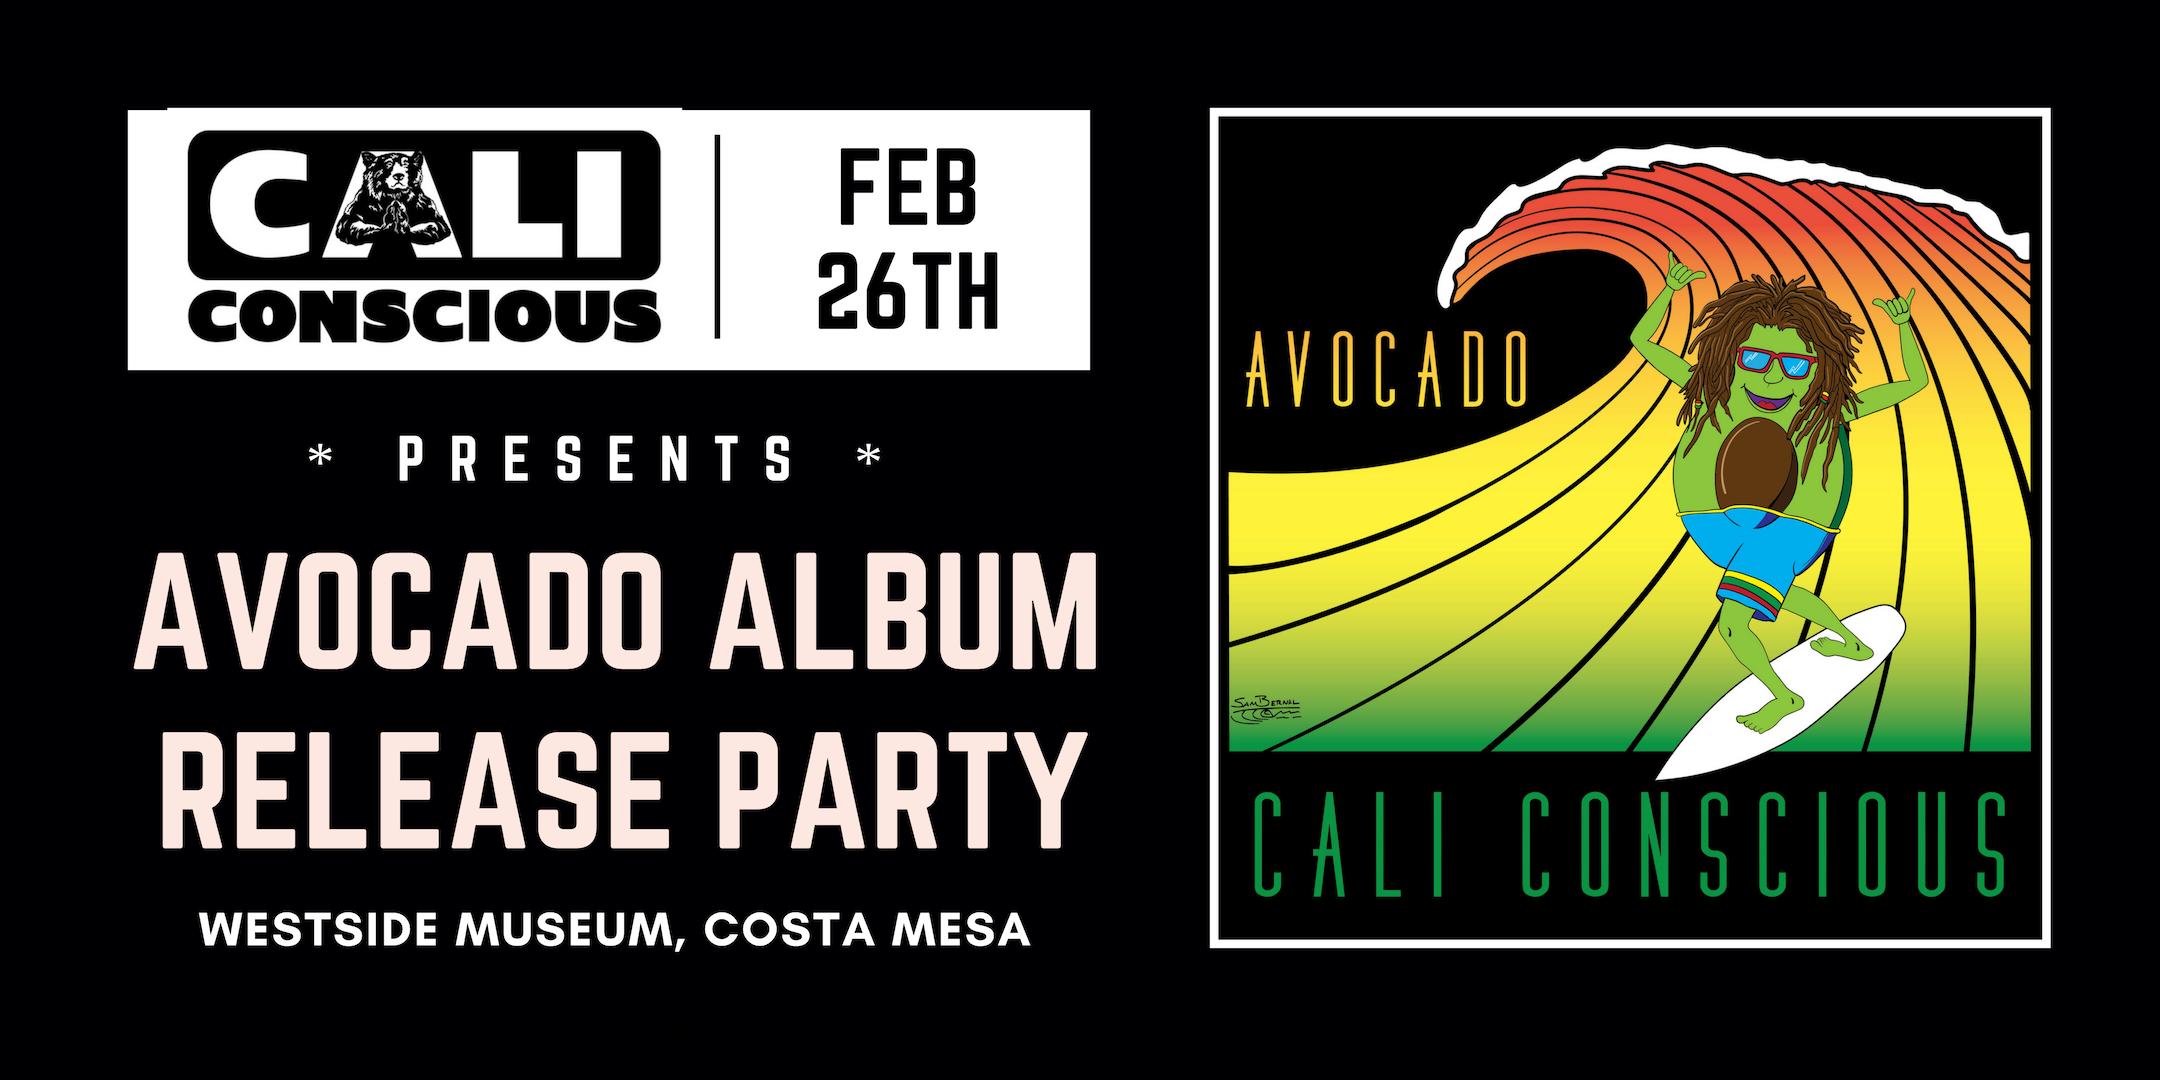 Cali-Conscious-Avocado-Album-Release-Party.png